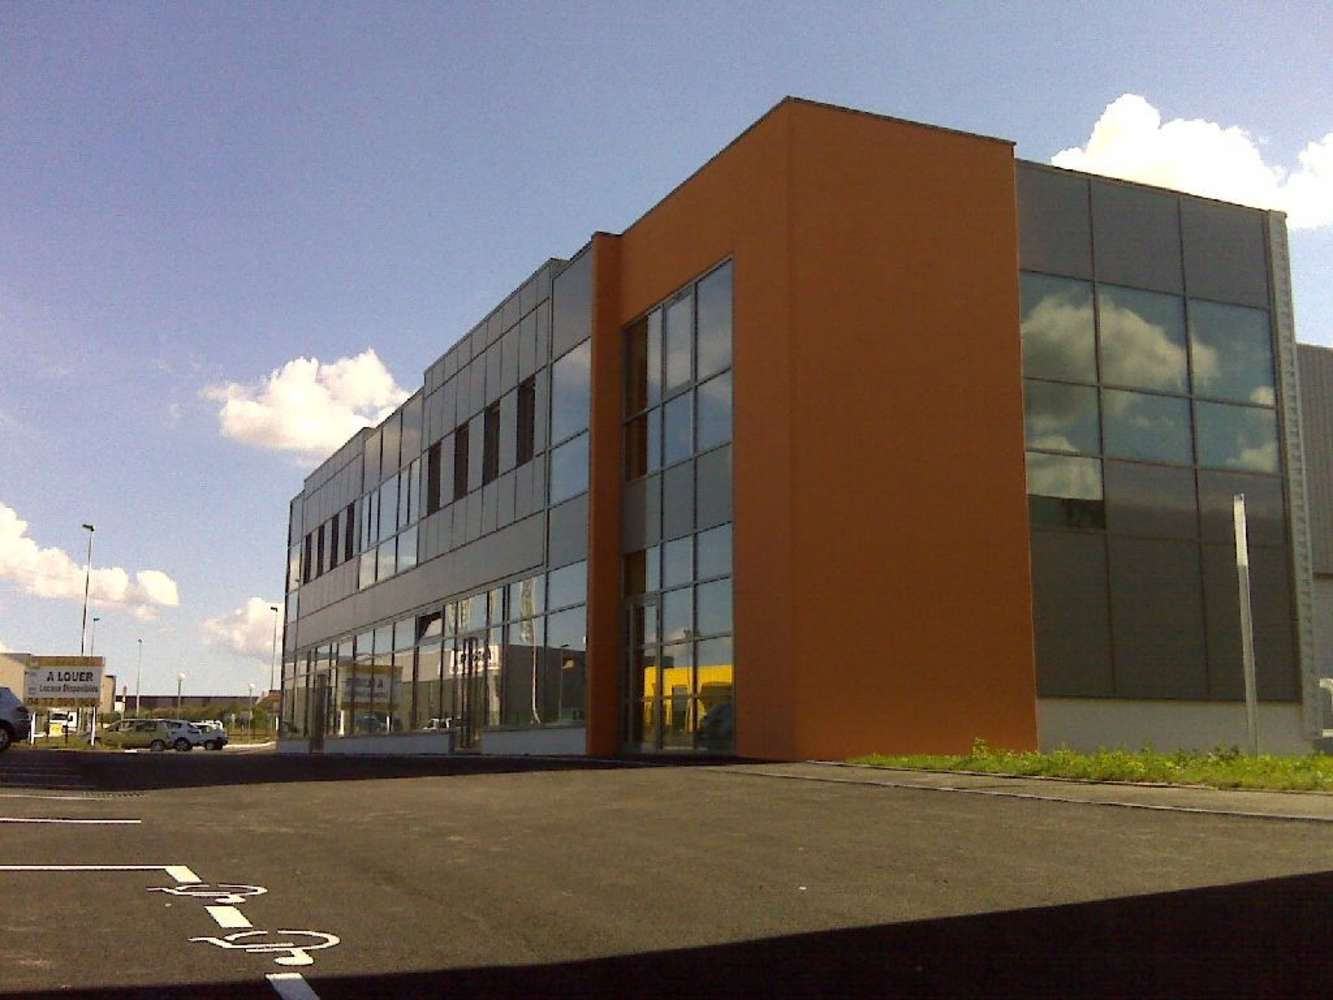 Activités/entrepôt Arnas, 69400 - Local d'activité à louer - Arnas (69) - 10021055